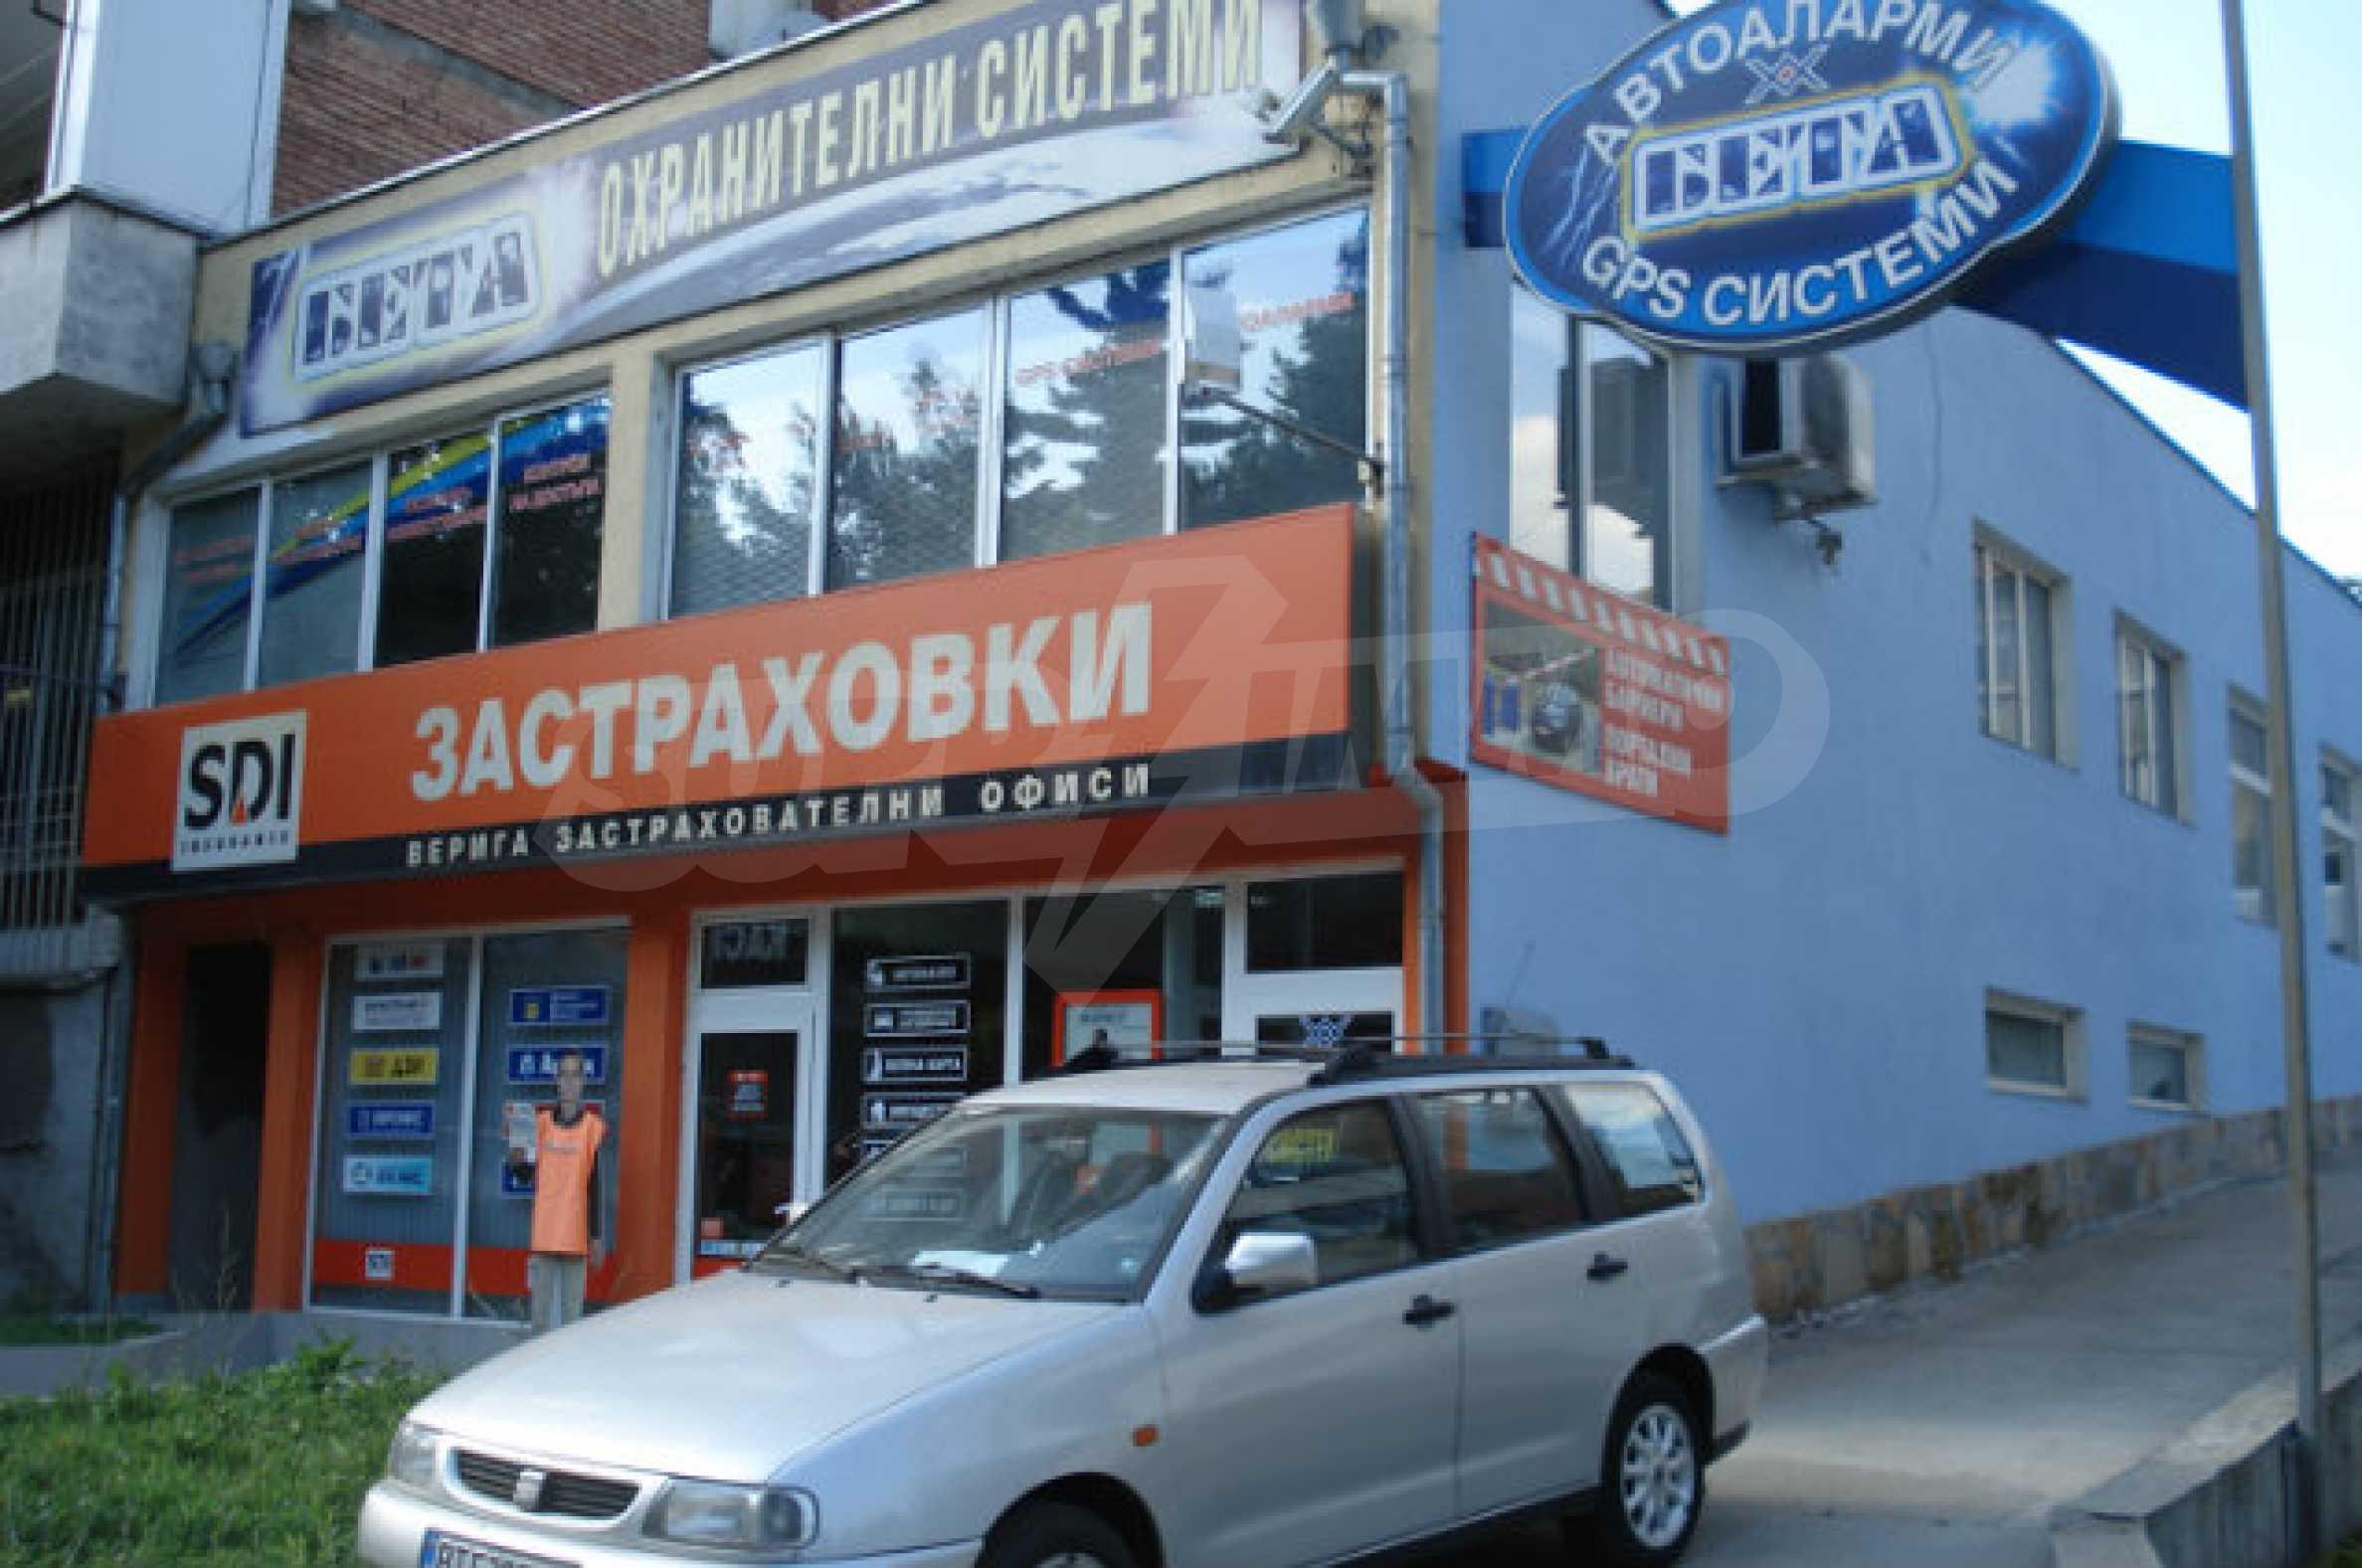 An office building in the center of Veliko Tarnovo 6